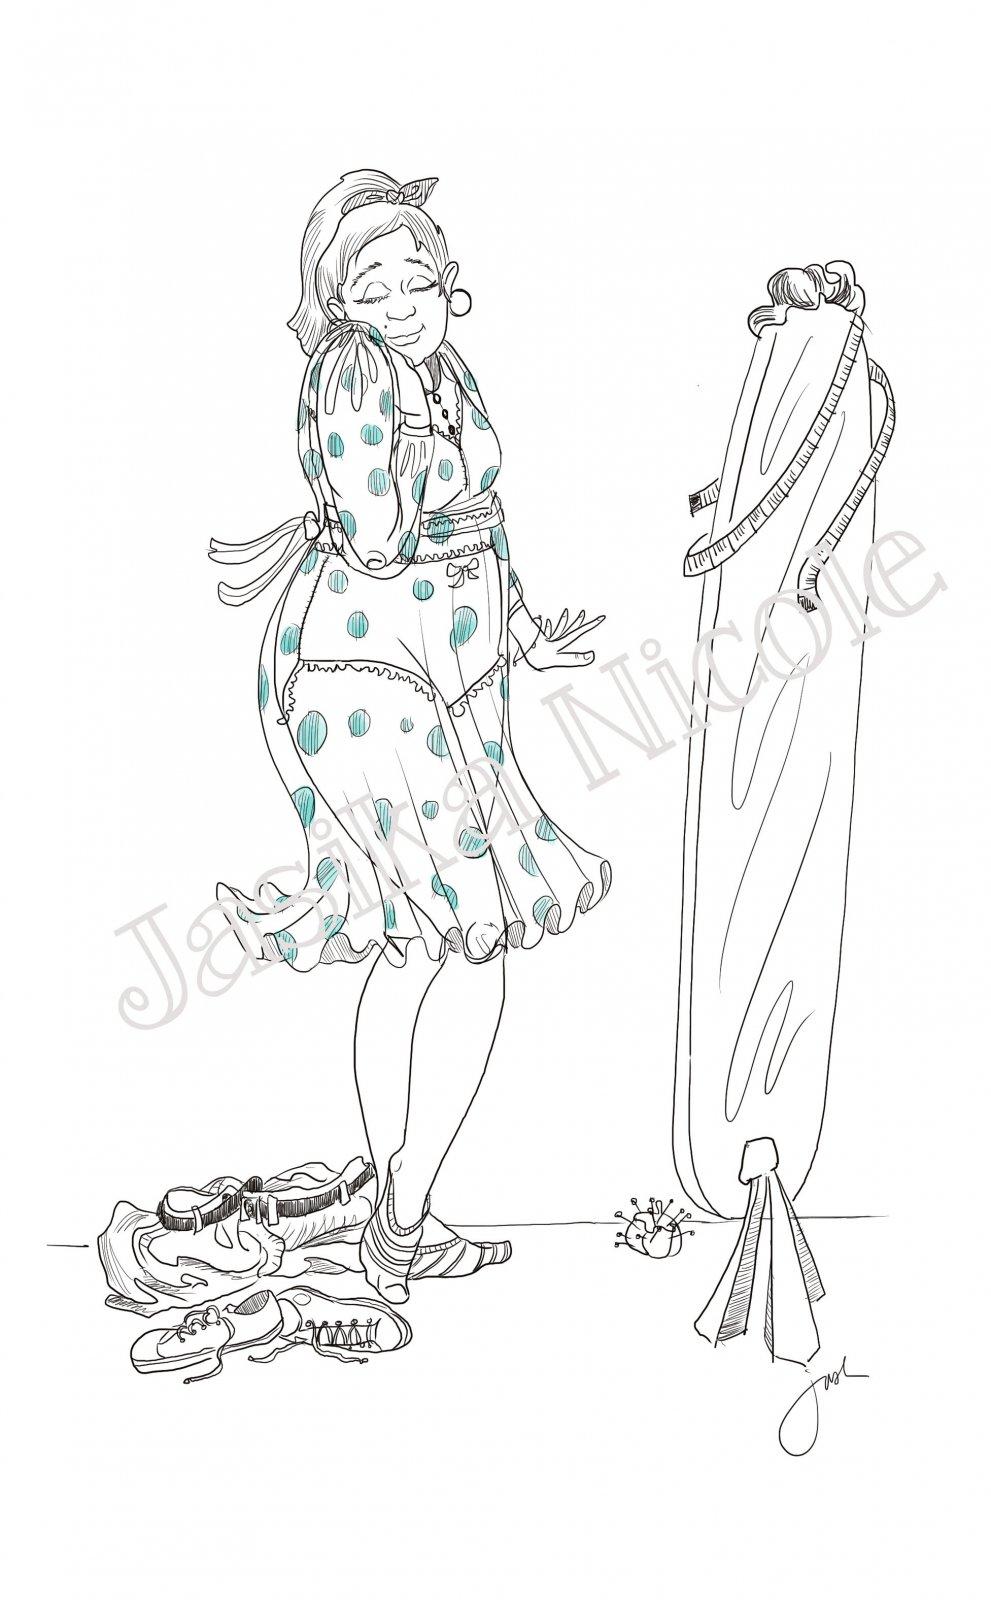 Sew Good Illustration by Jasika Nicole; 11x17